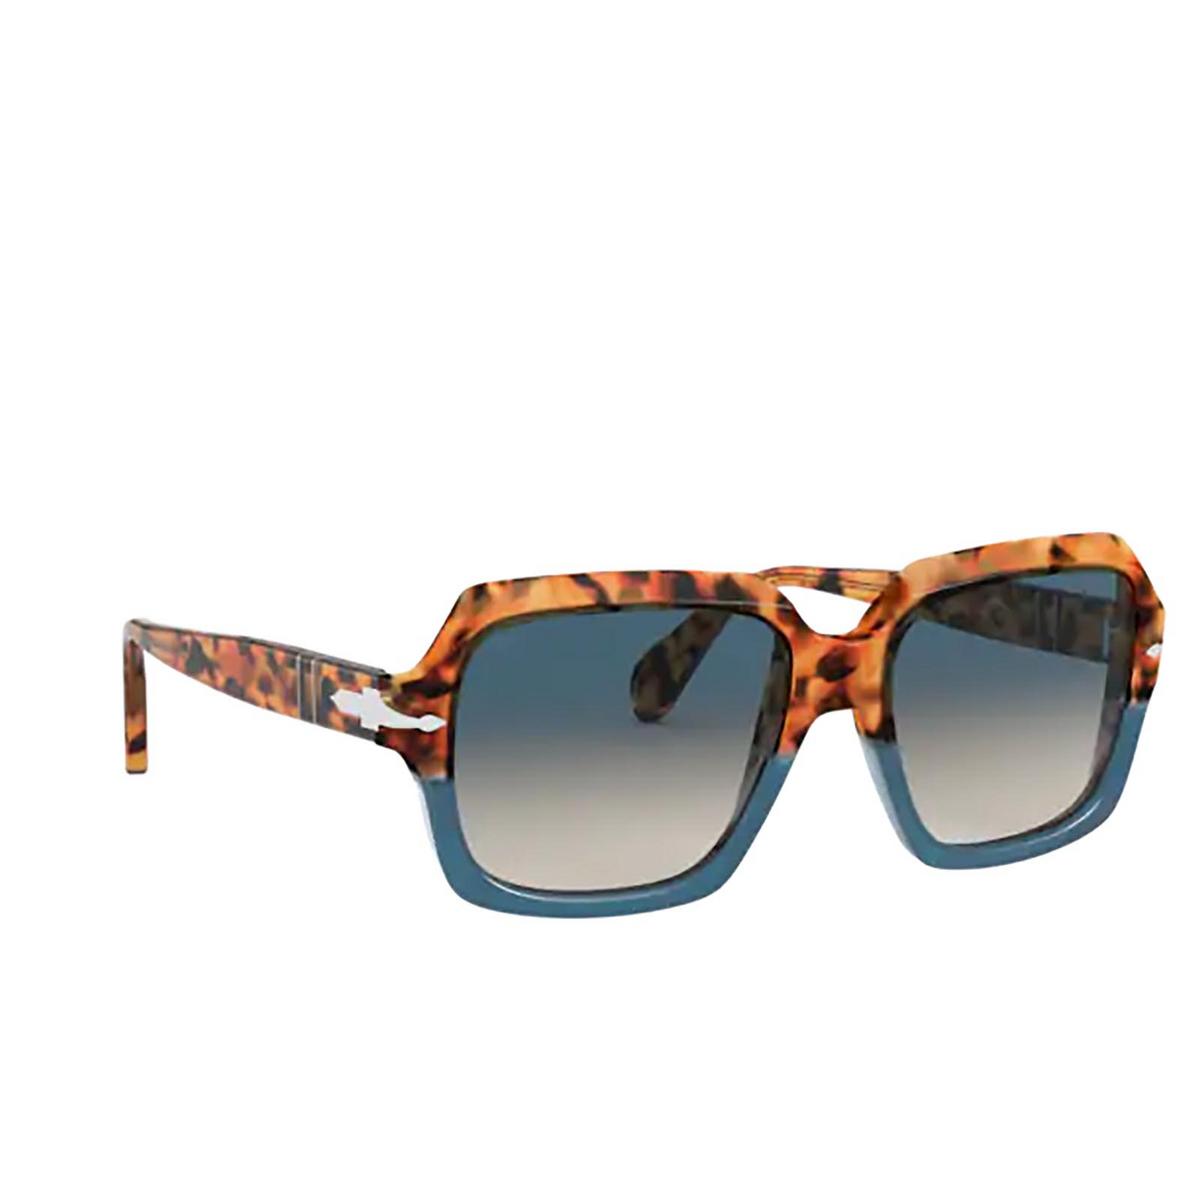 Persol® Square Sunglasses: PO0581S color Brown Tortoise & Opal Blue 112032 - three-quarters view.